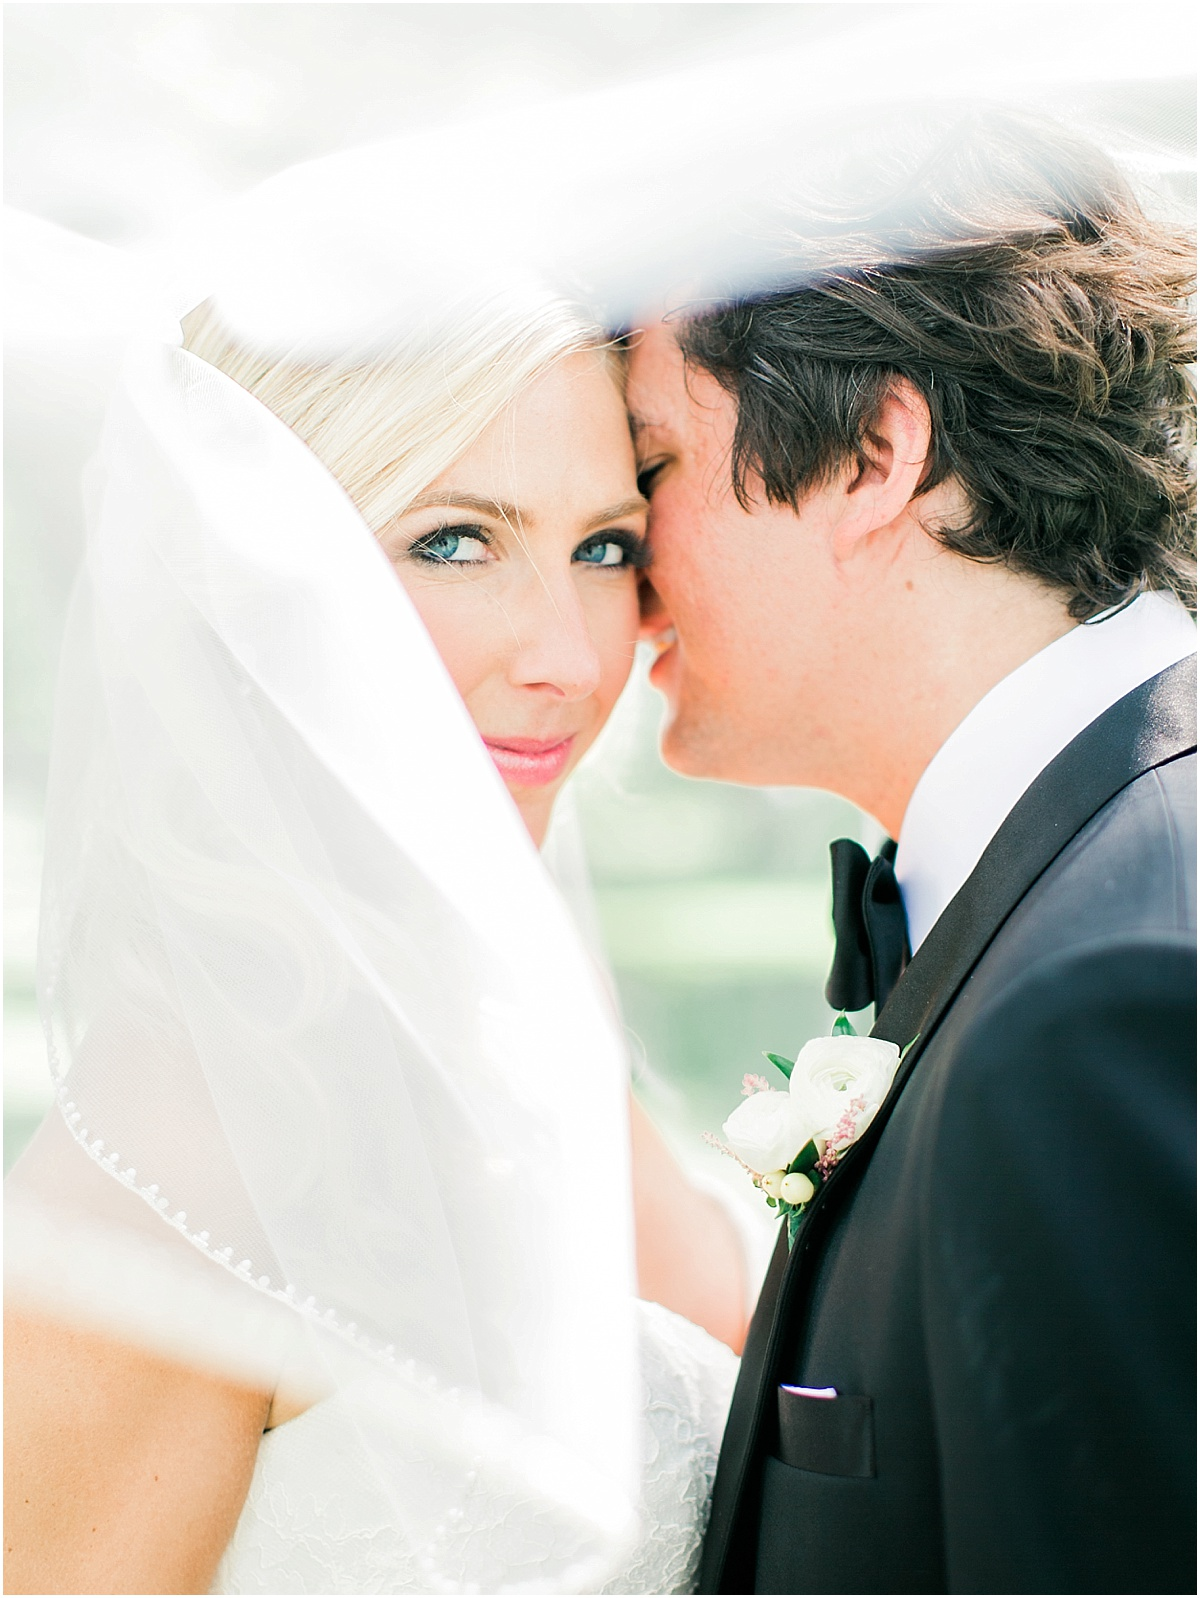 St_Louis_Wedding_Fine_Art_Film_Photographer_Jordan_Brittley_(www.jordanbrittley.com)_0015.jpg